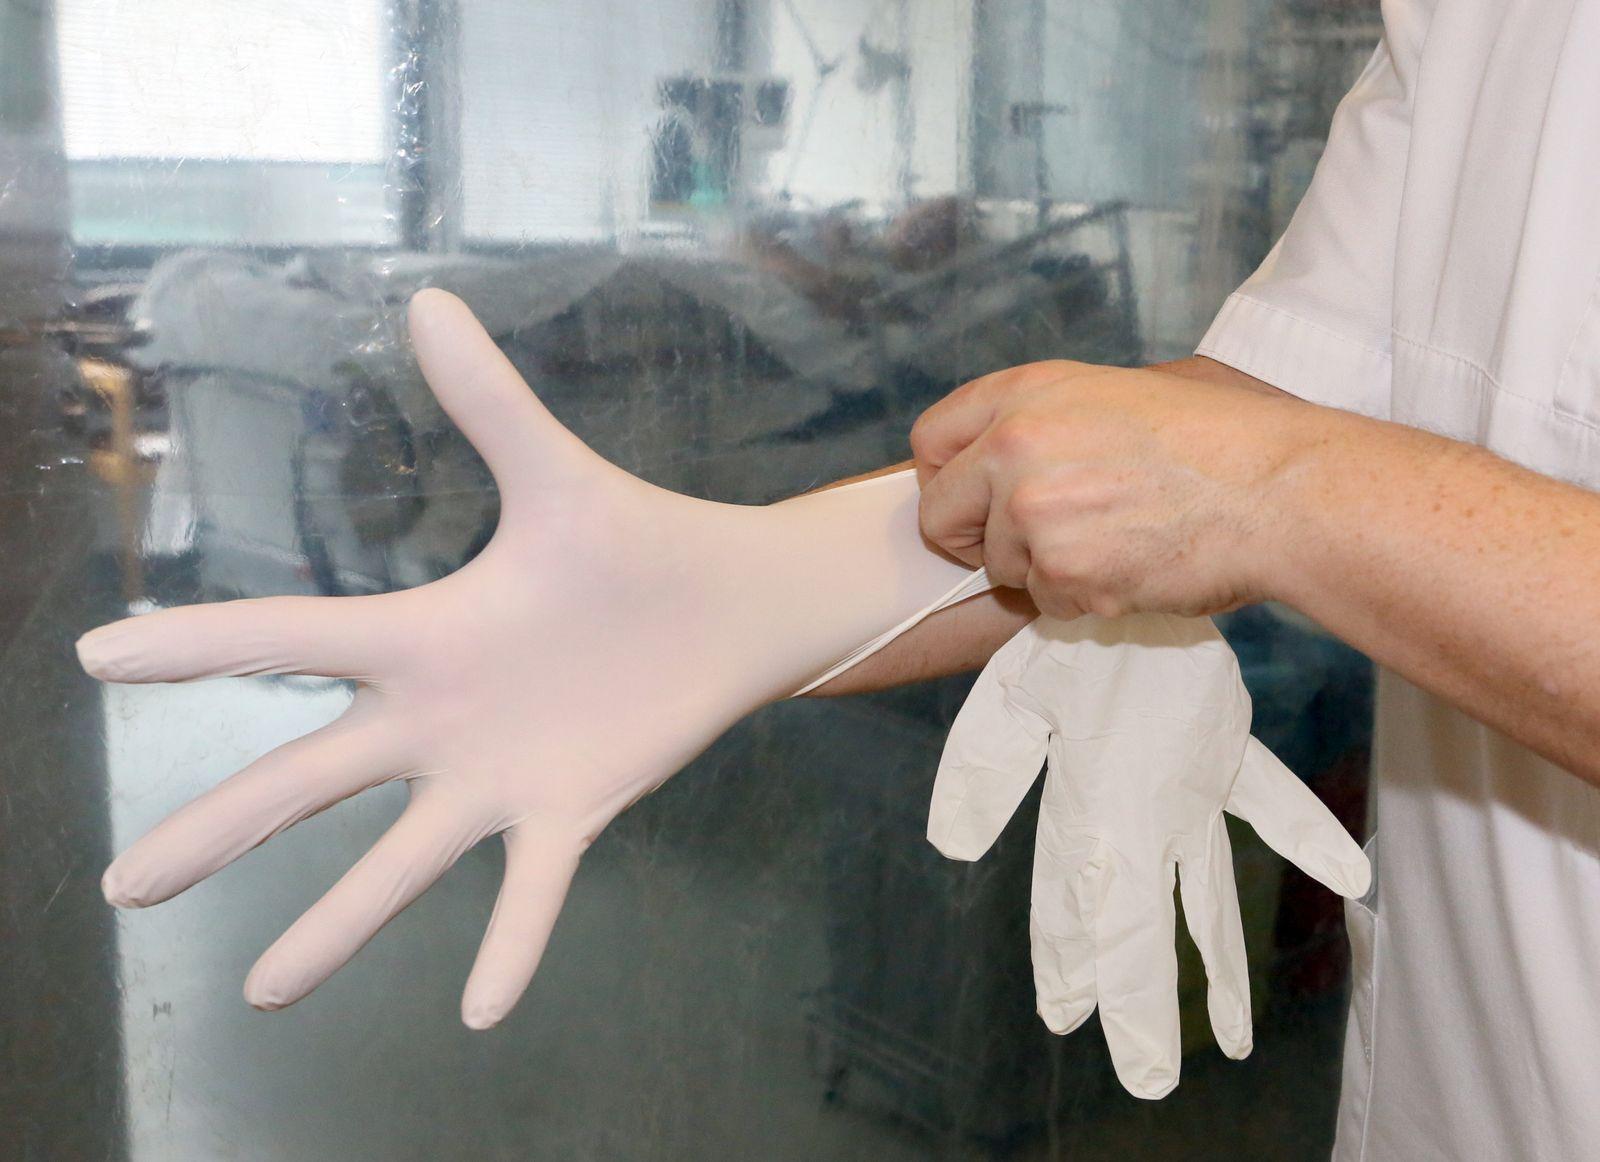 Krankenhaus-Hygiene/ Handschuhe